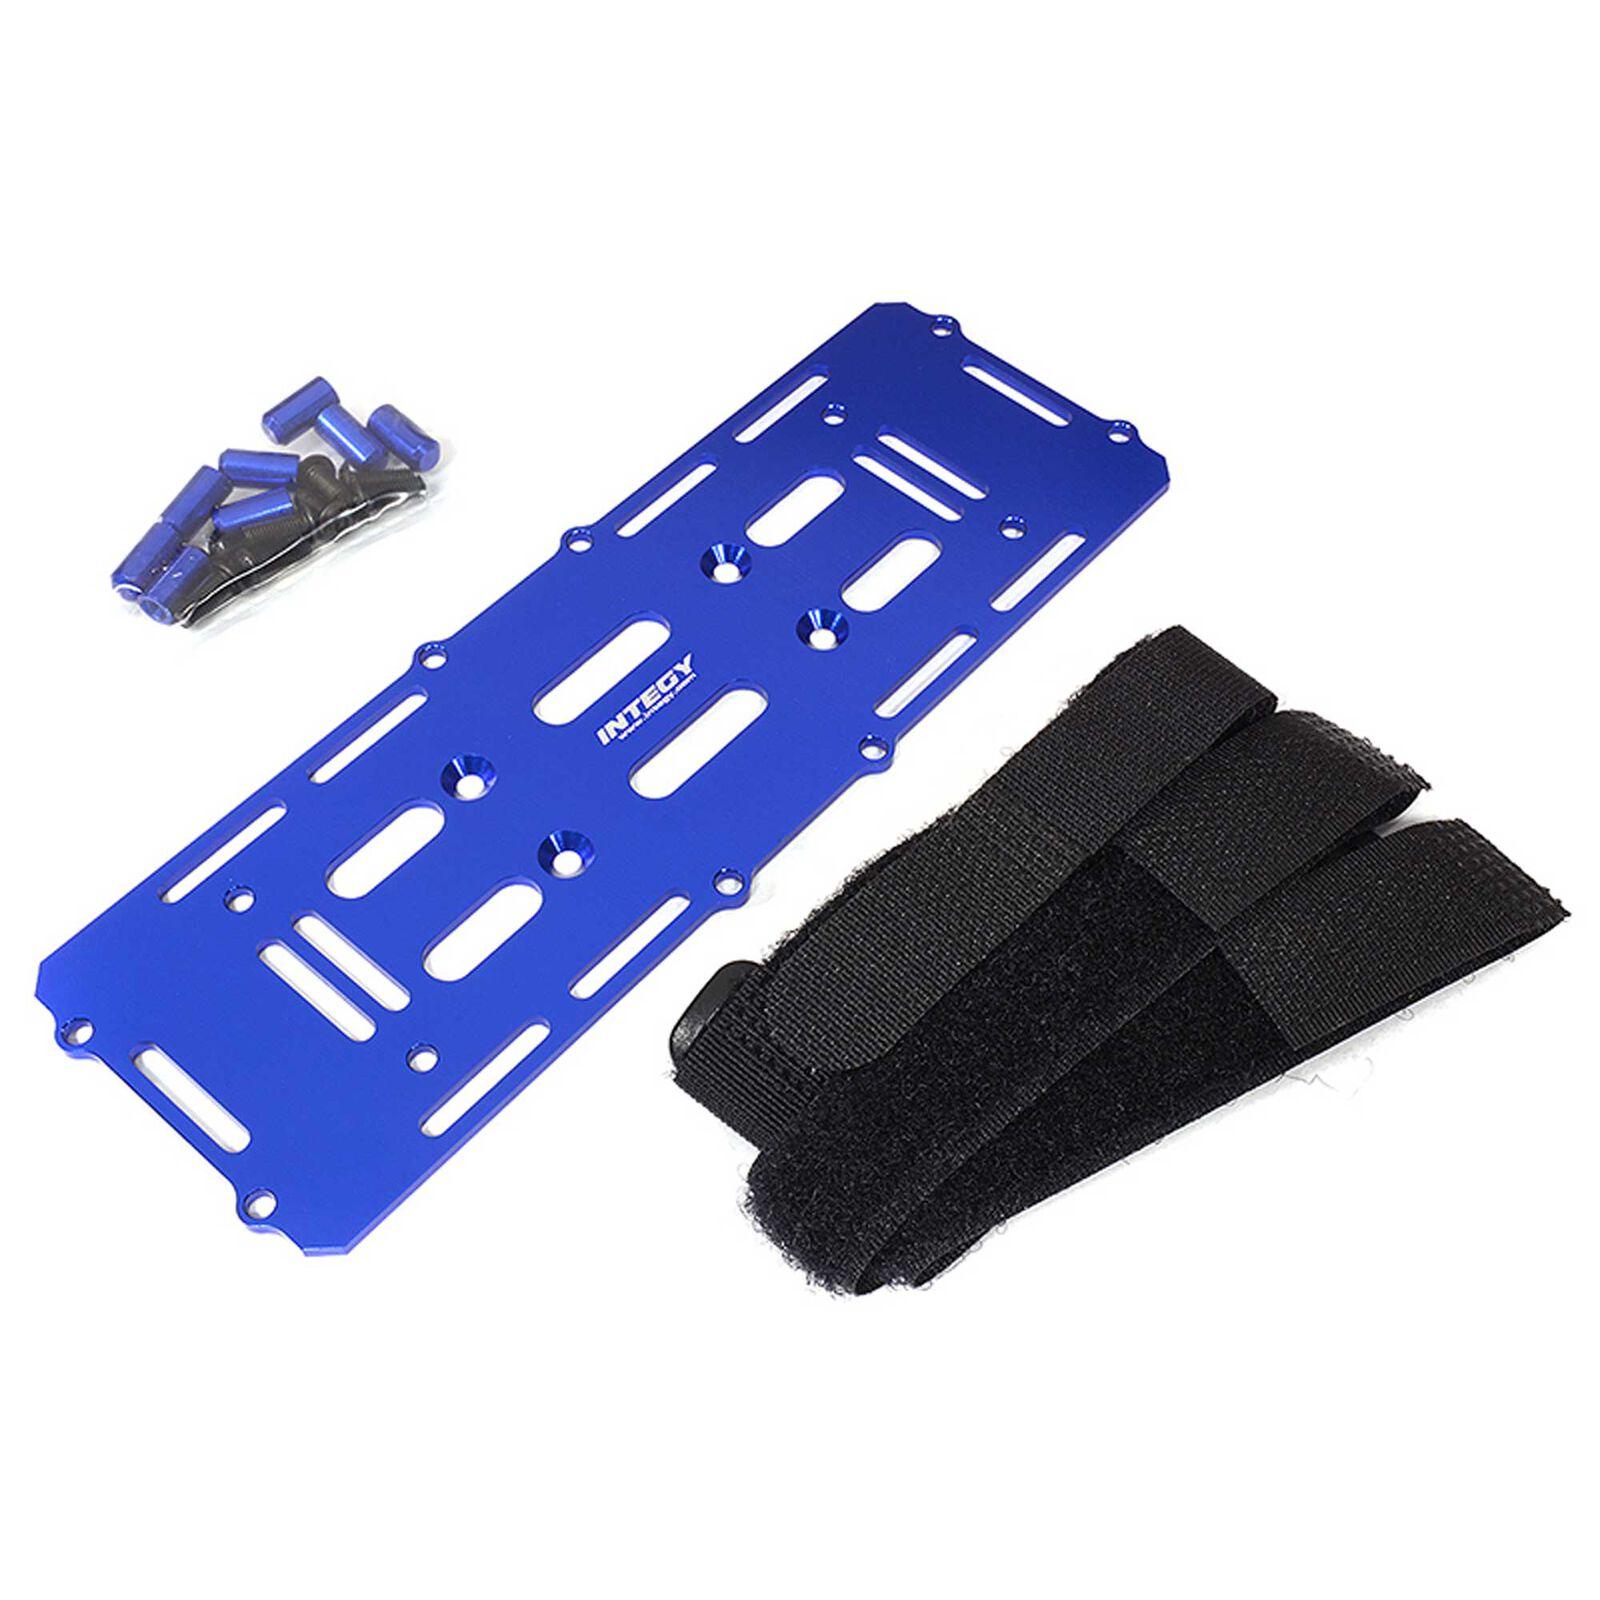 Battery Mounting Plate, Blue: 1/10 Enduro Sendero